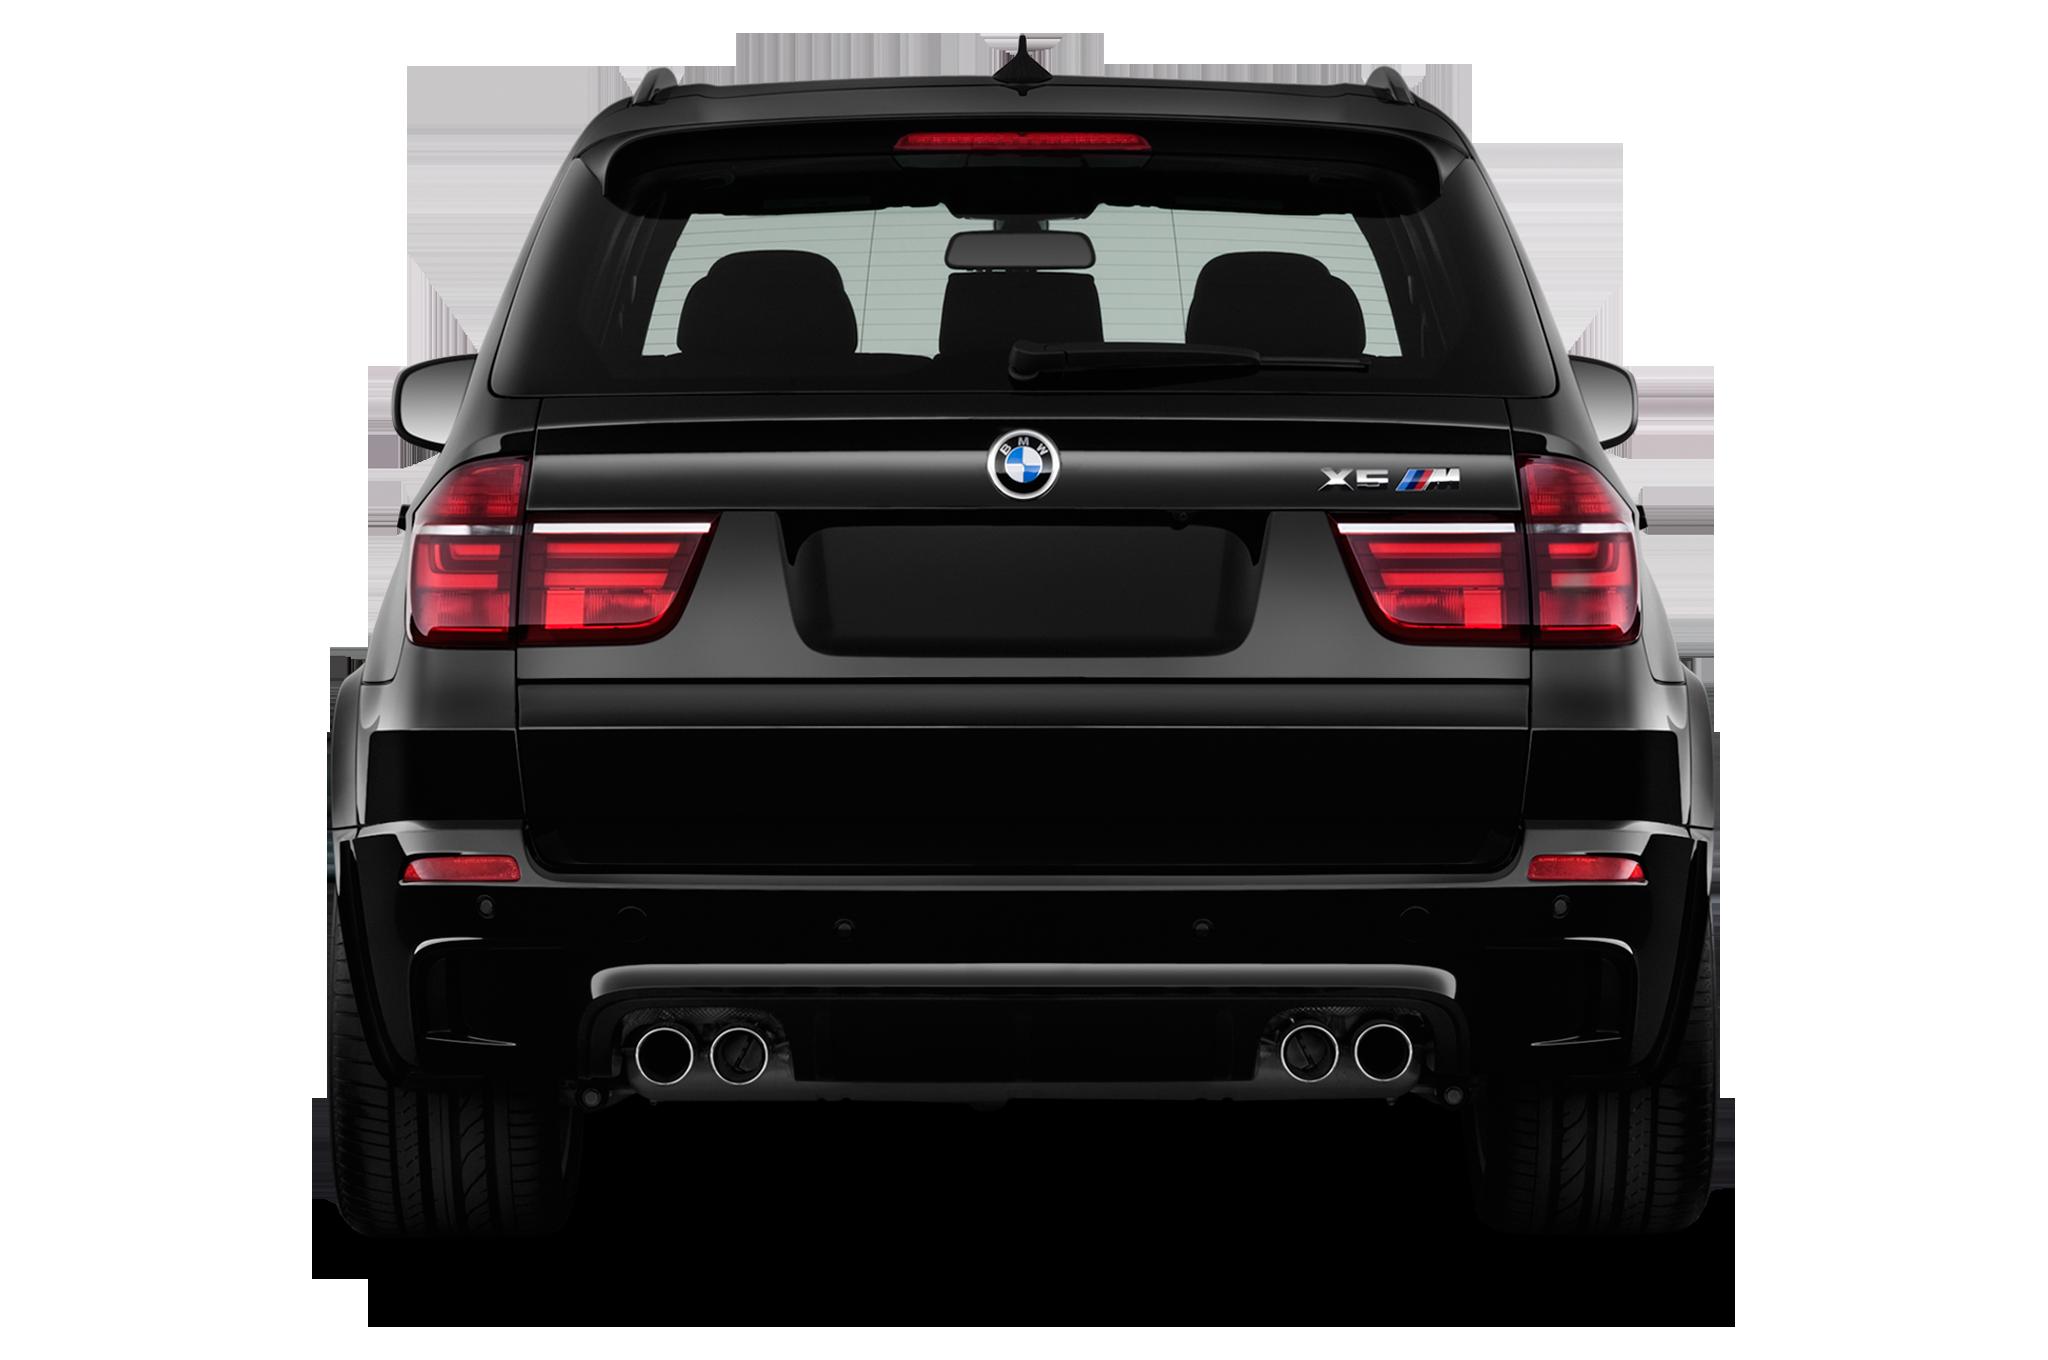 BMW X5 M I (E70) 2009 - 2014 SUV 5 door #6